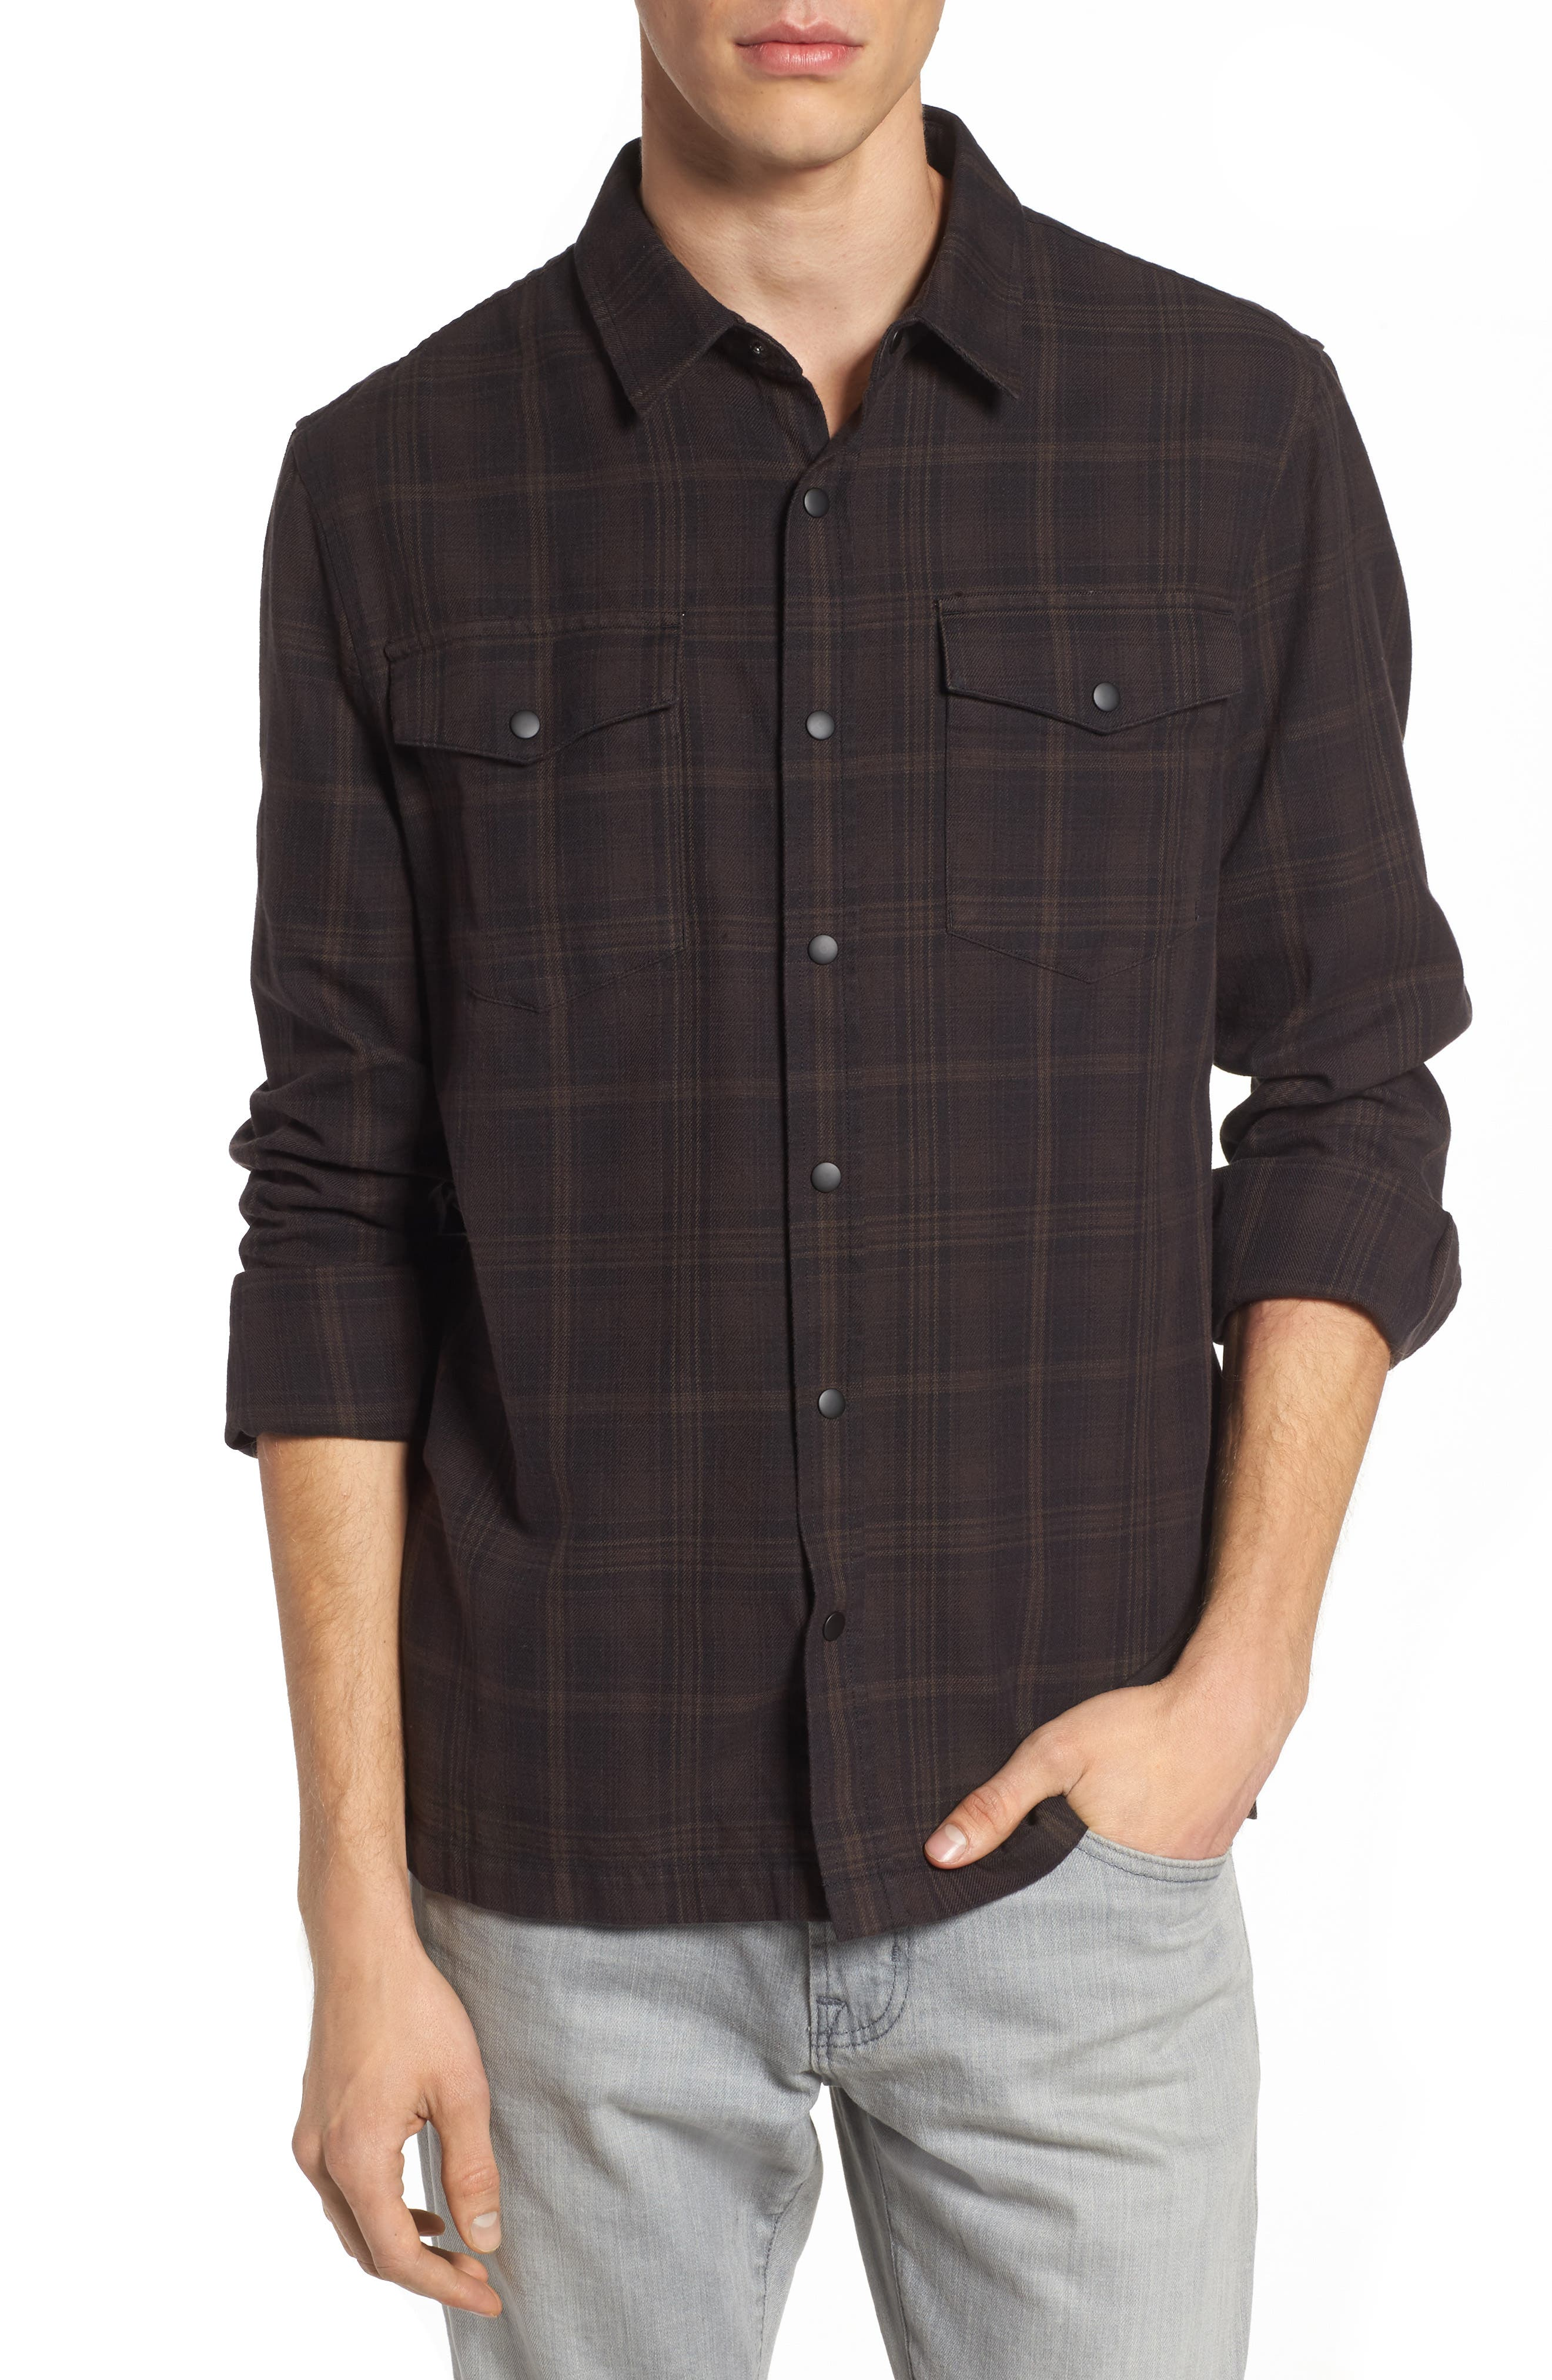 Boone Slim Plaid Overshirt,                             Main thumbnail 1, color,                             Black/ Silica Sand